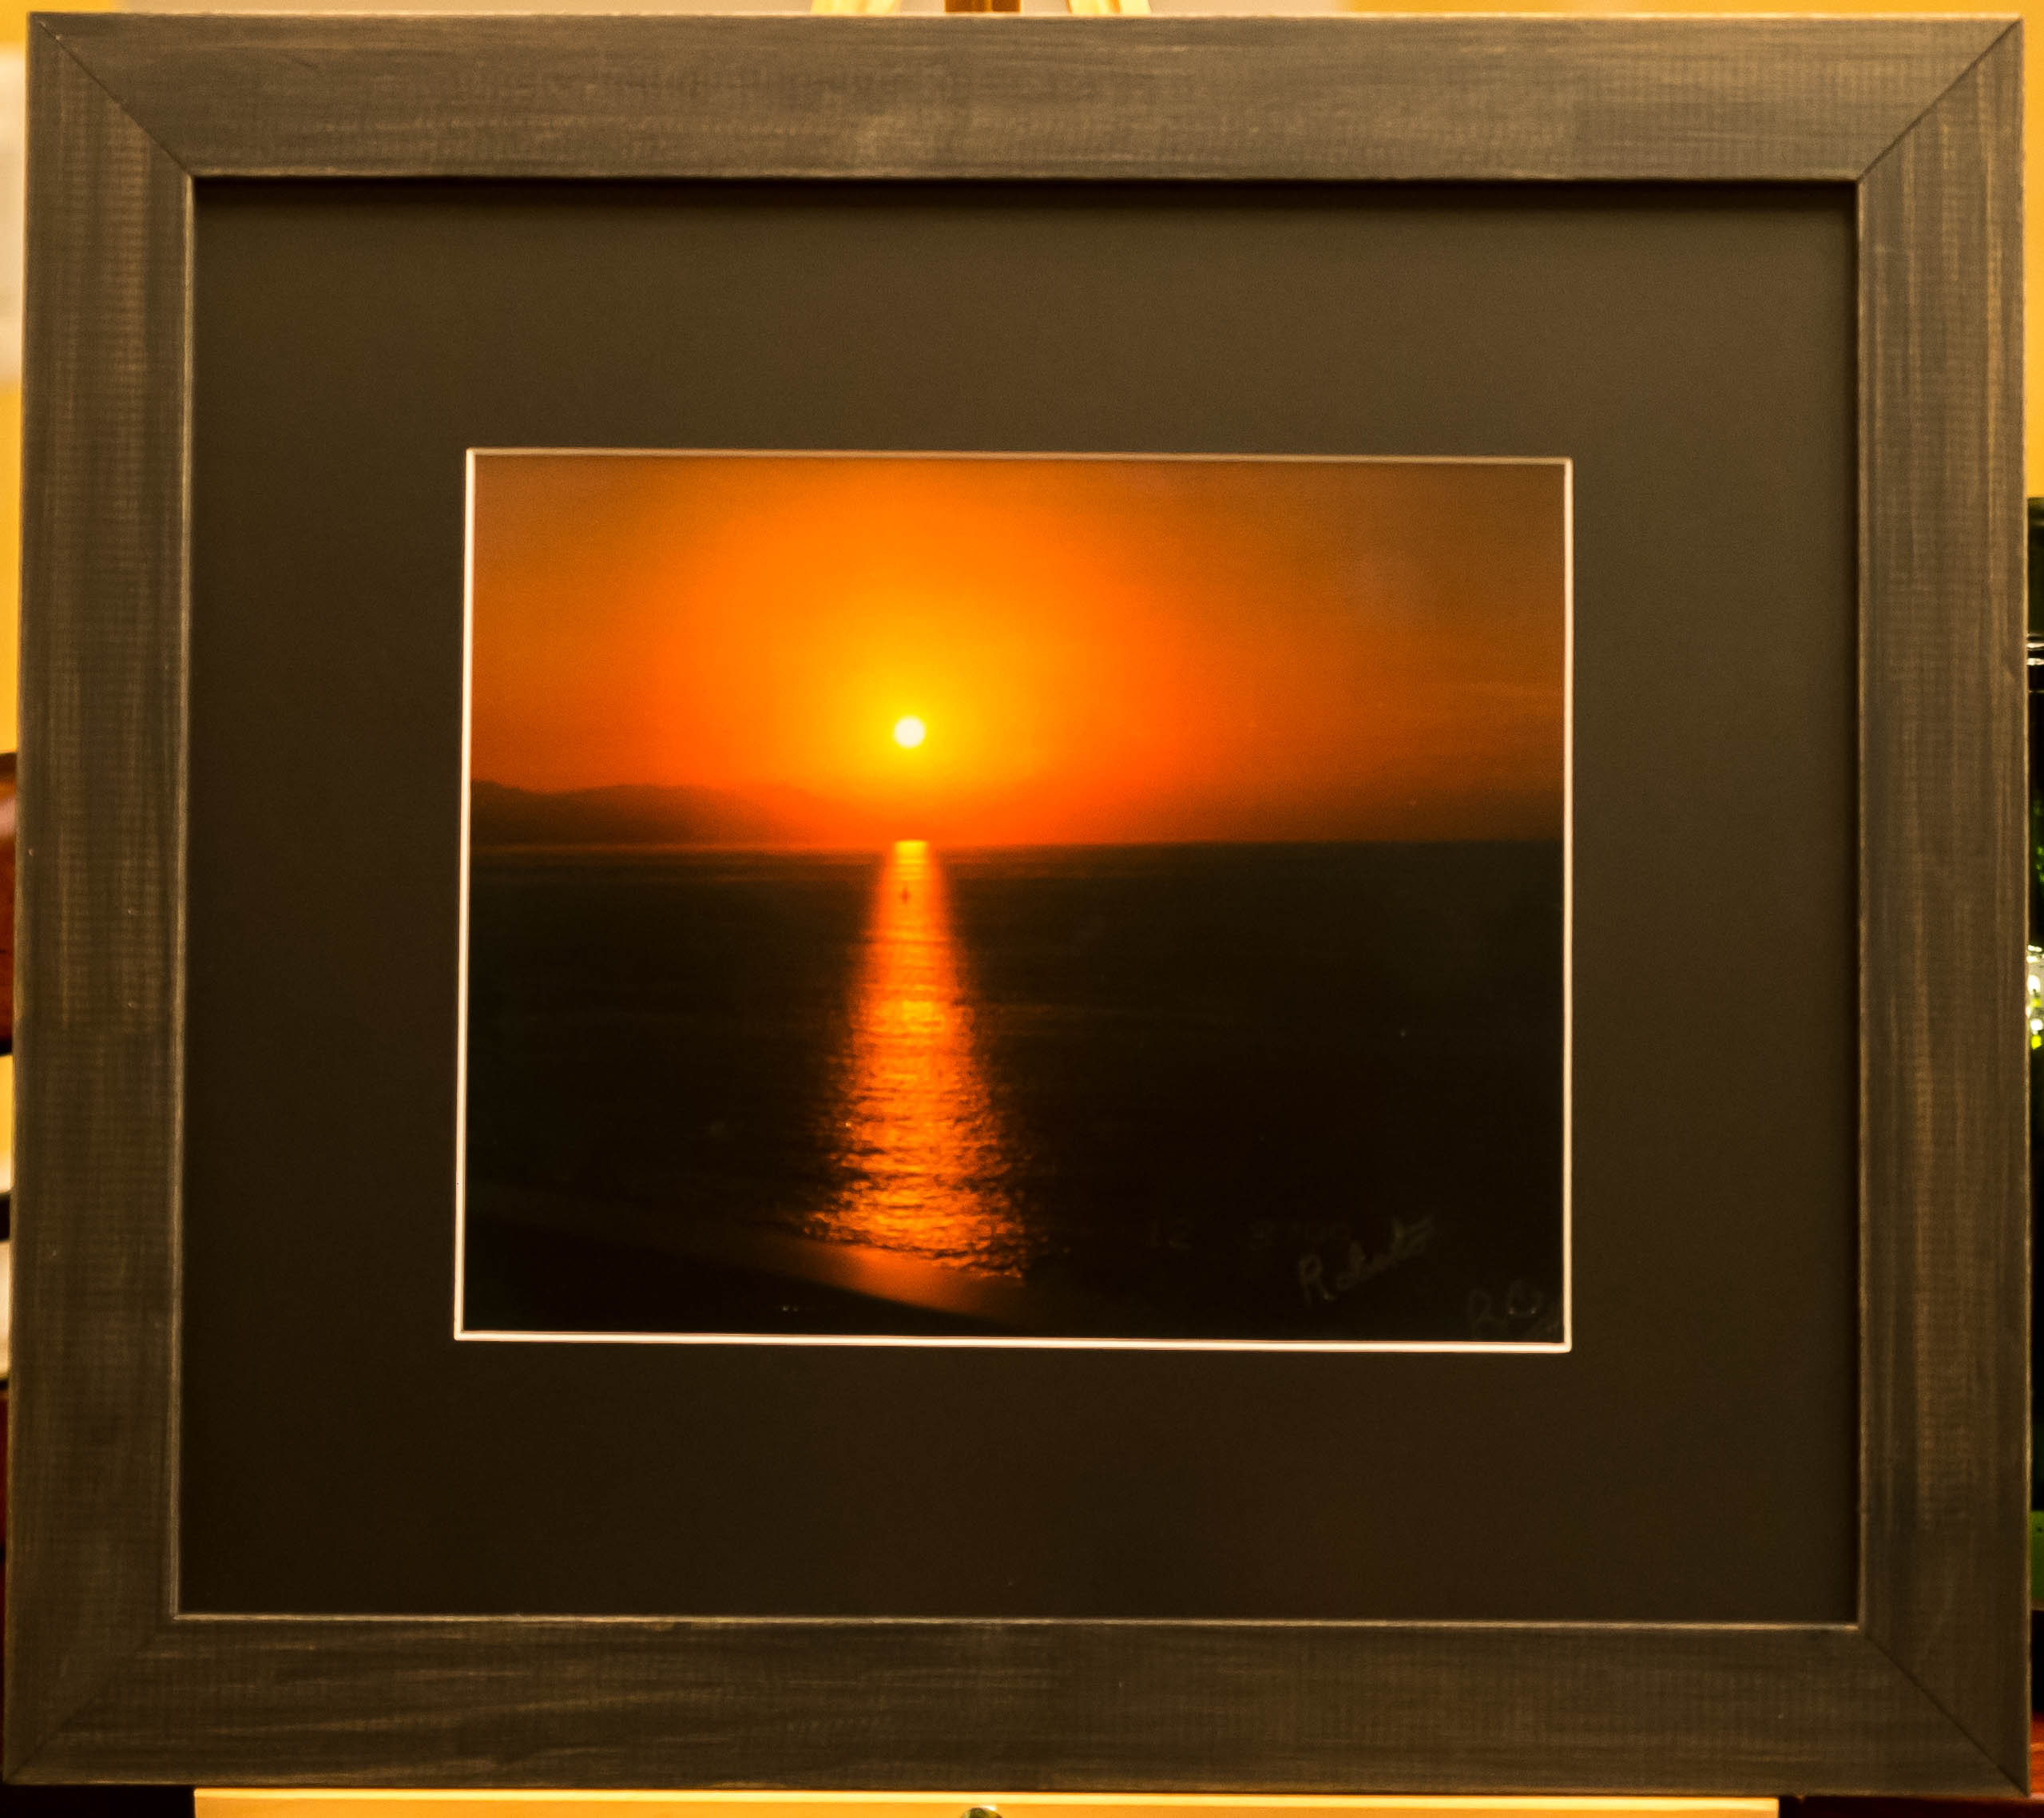 082315 Sunsets-1.jpg